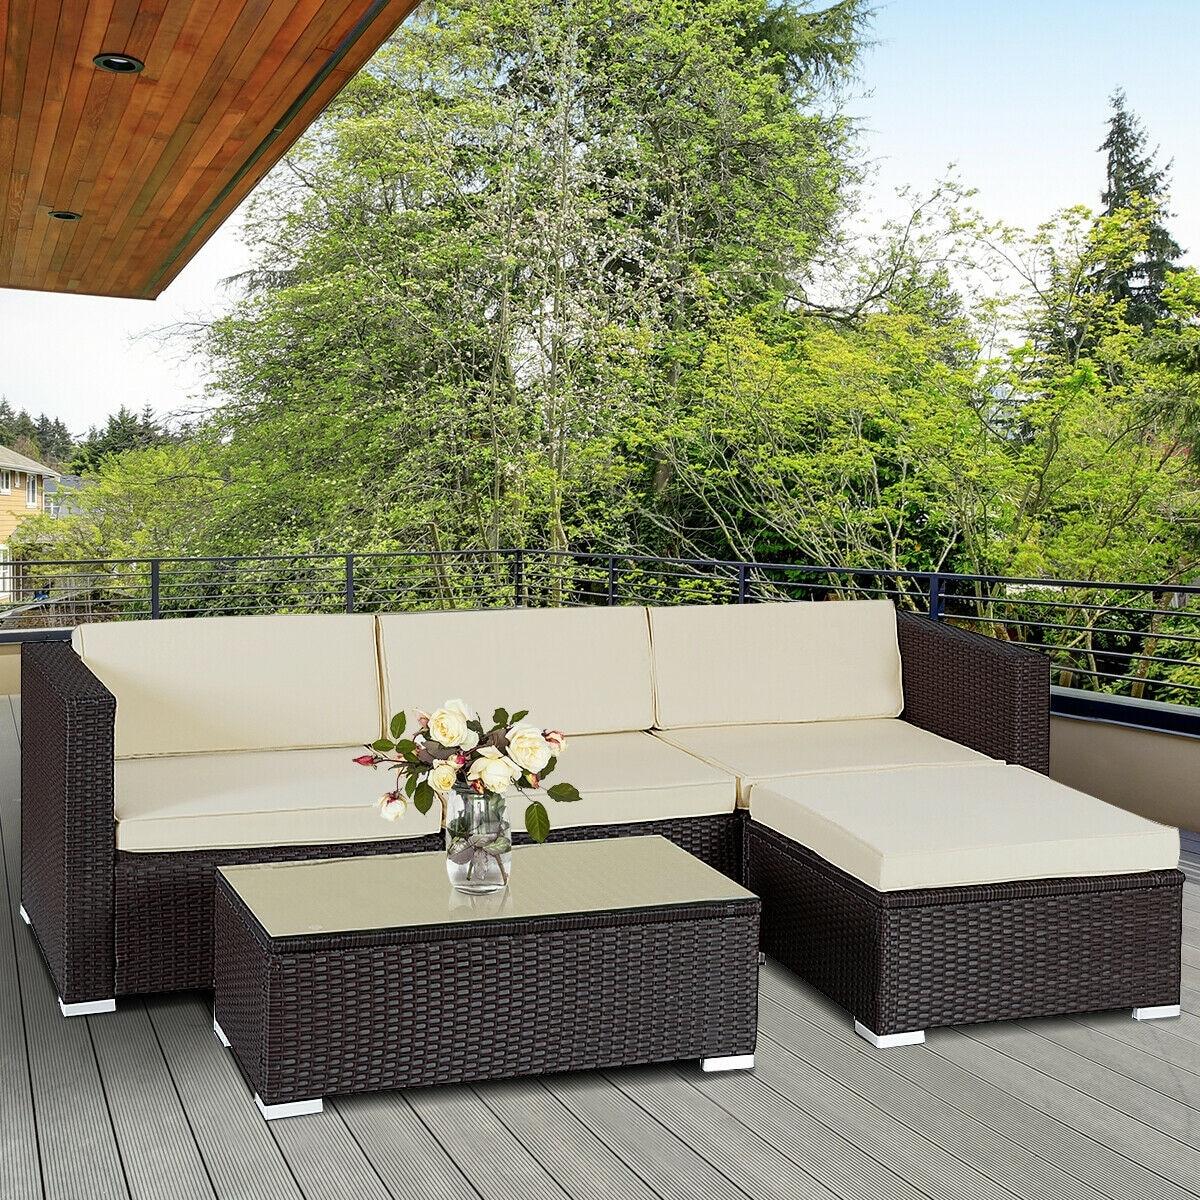 Costway 5 Pcs Patio Furniture Set